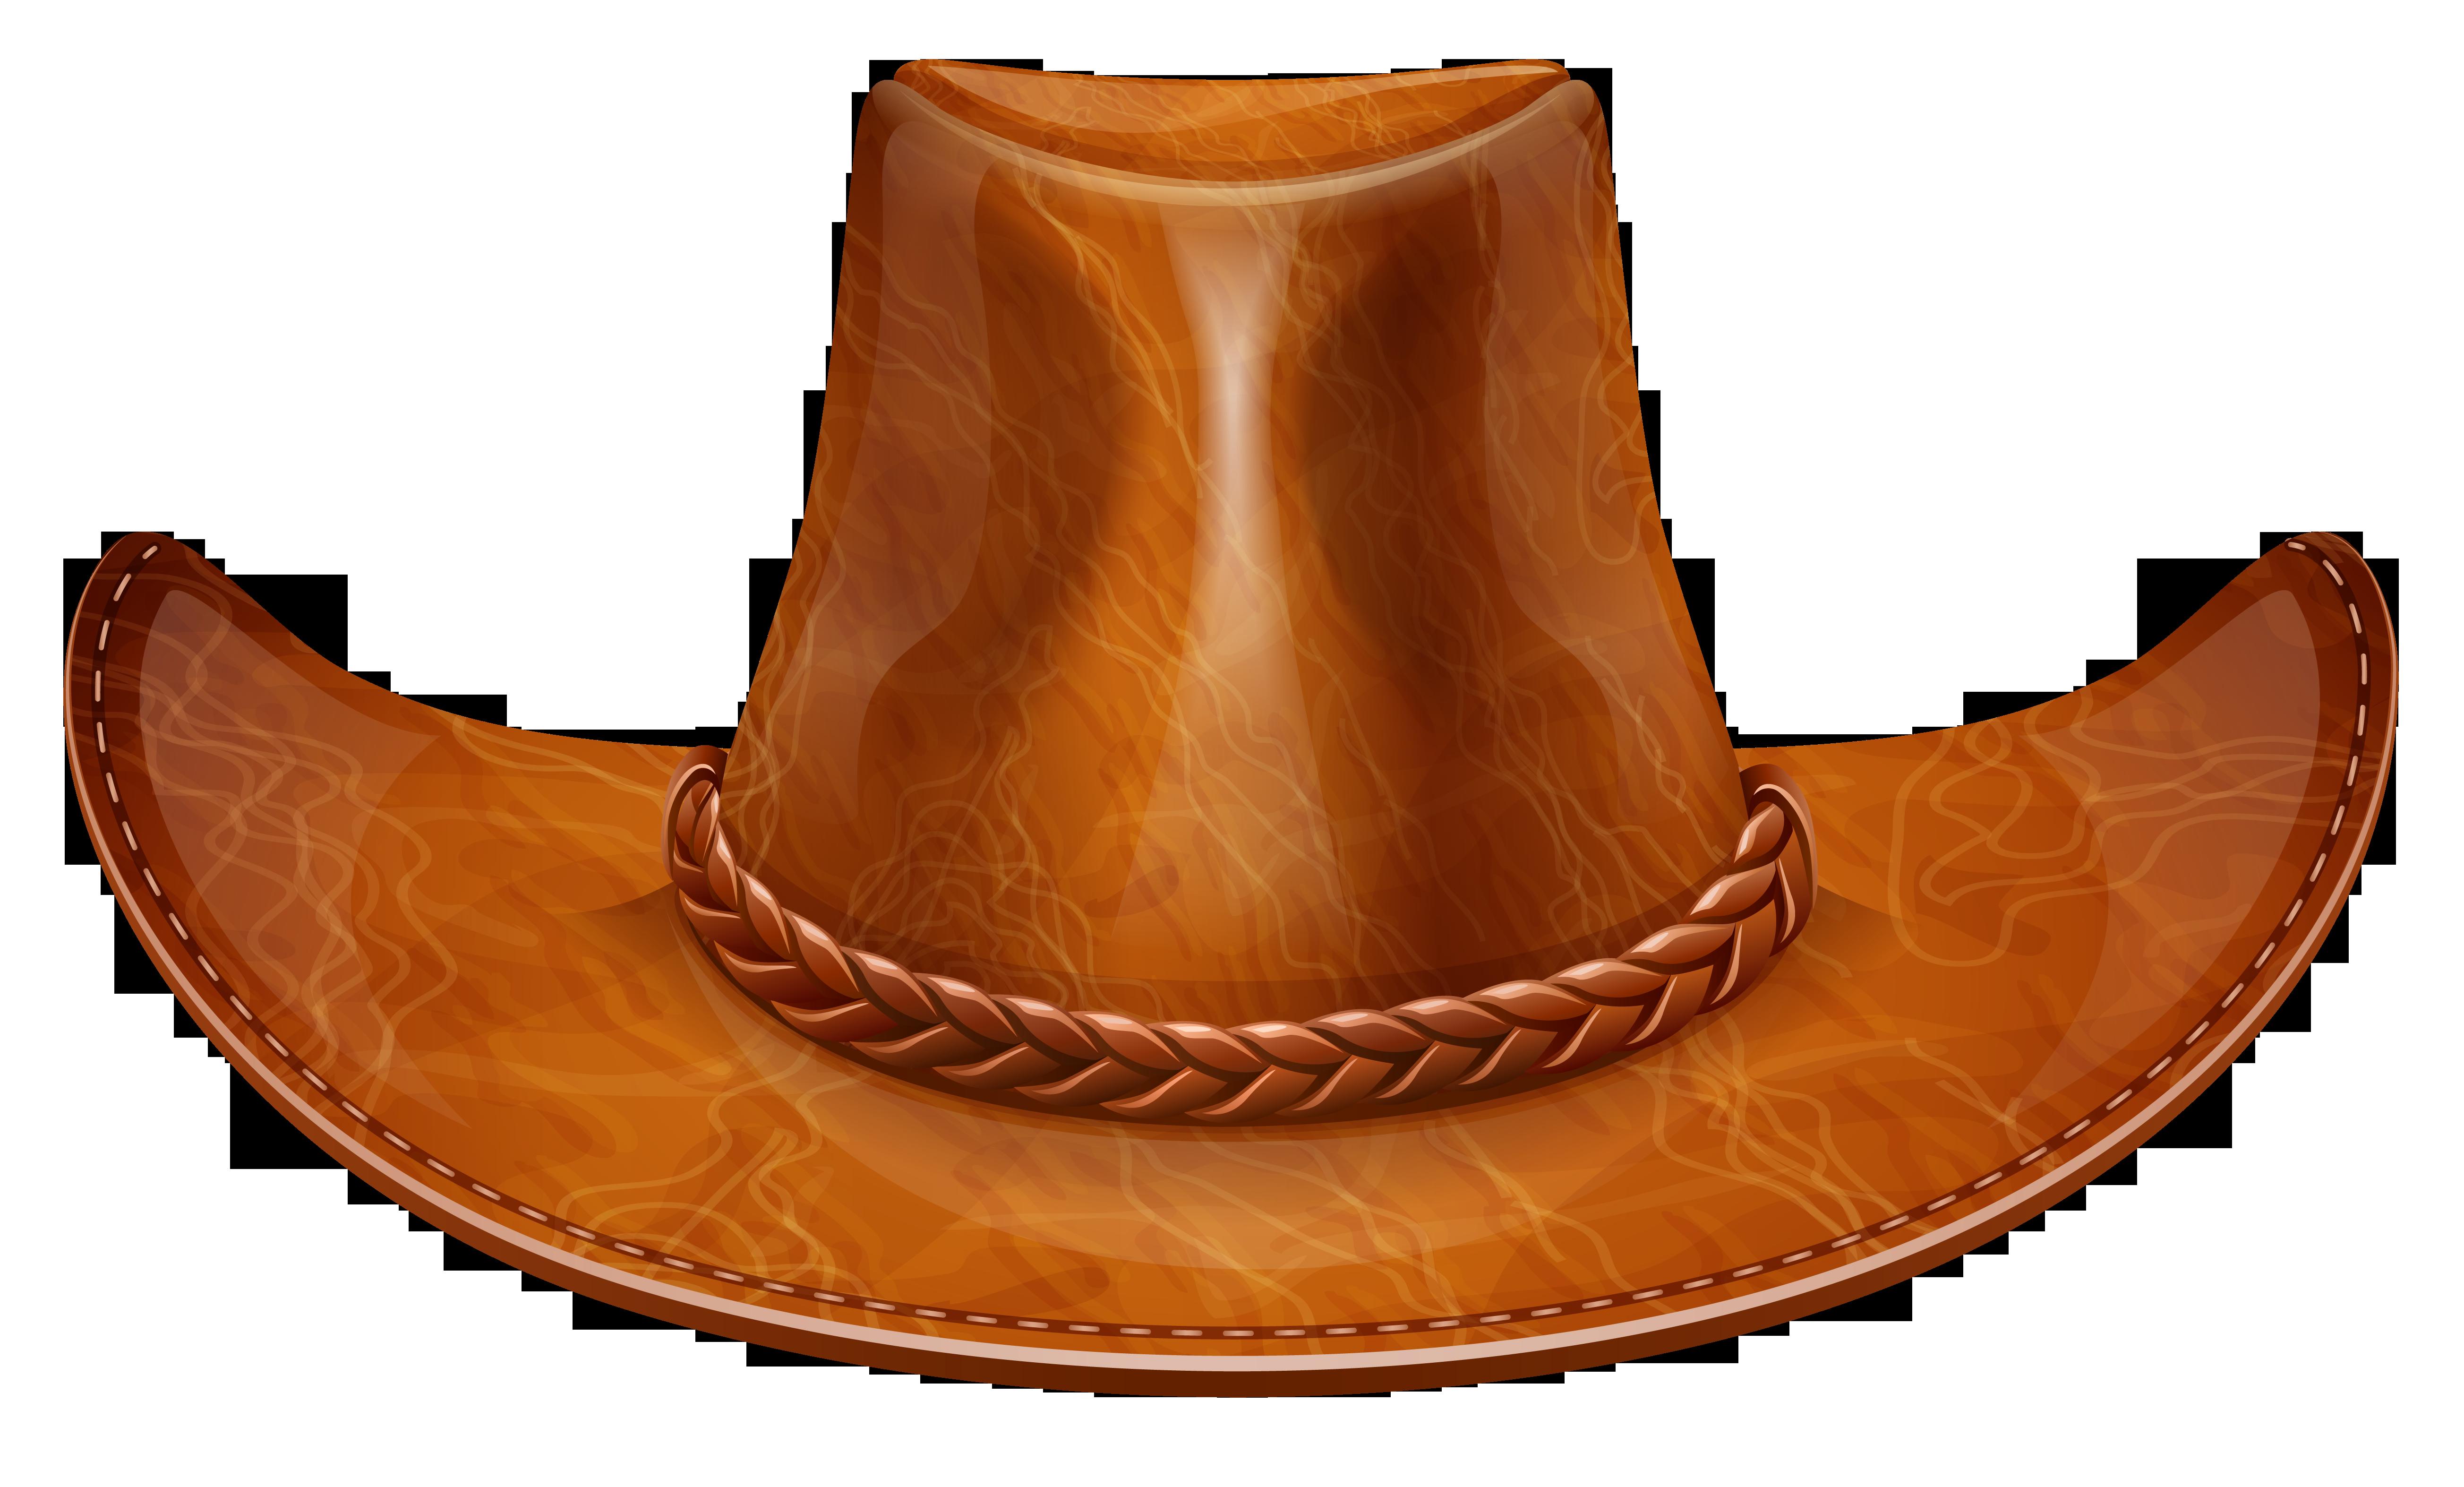 Cowboy Hat Image - Hat HD Image Ukjugs.Org e73ff3fe81f8